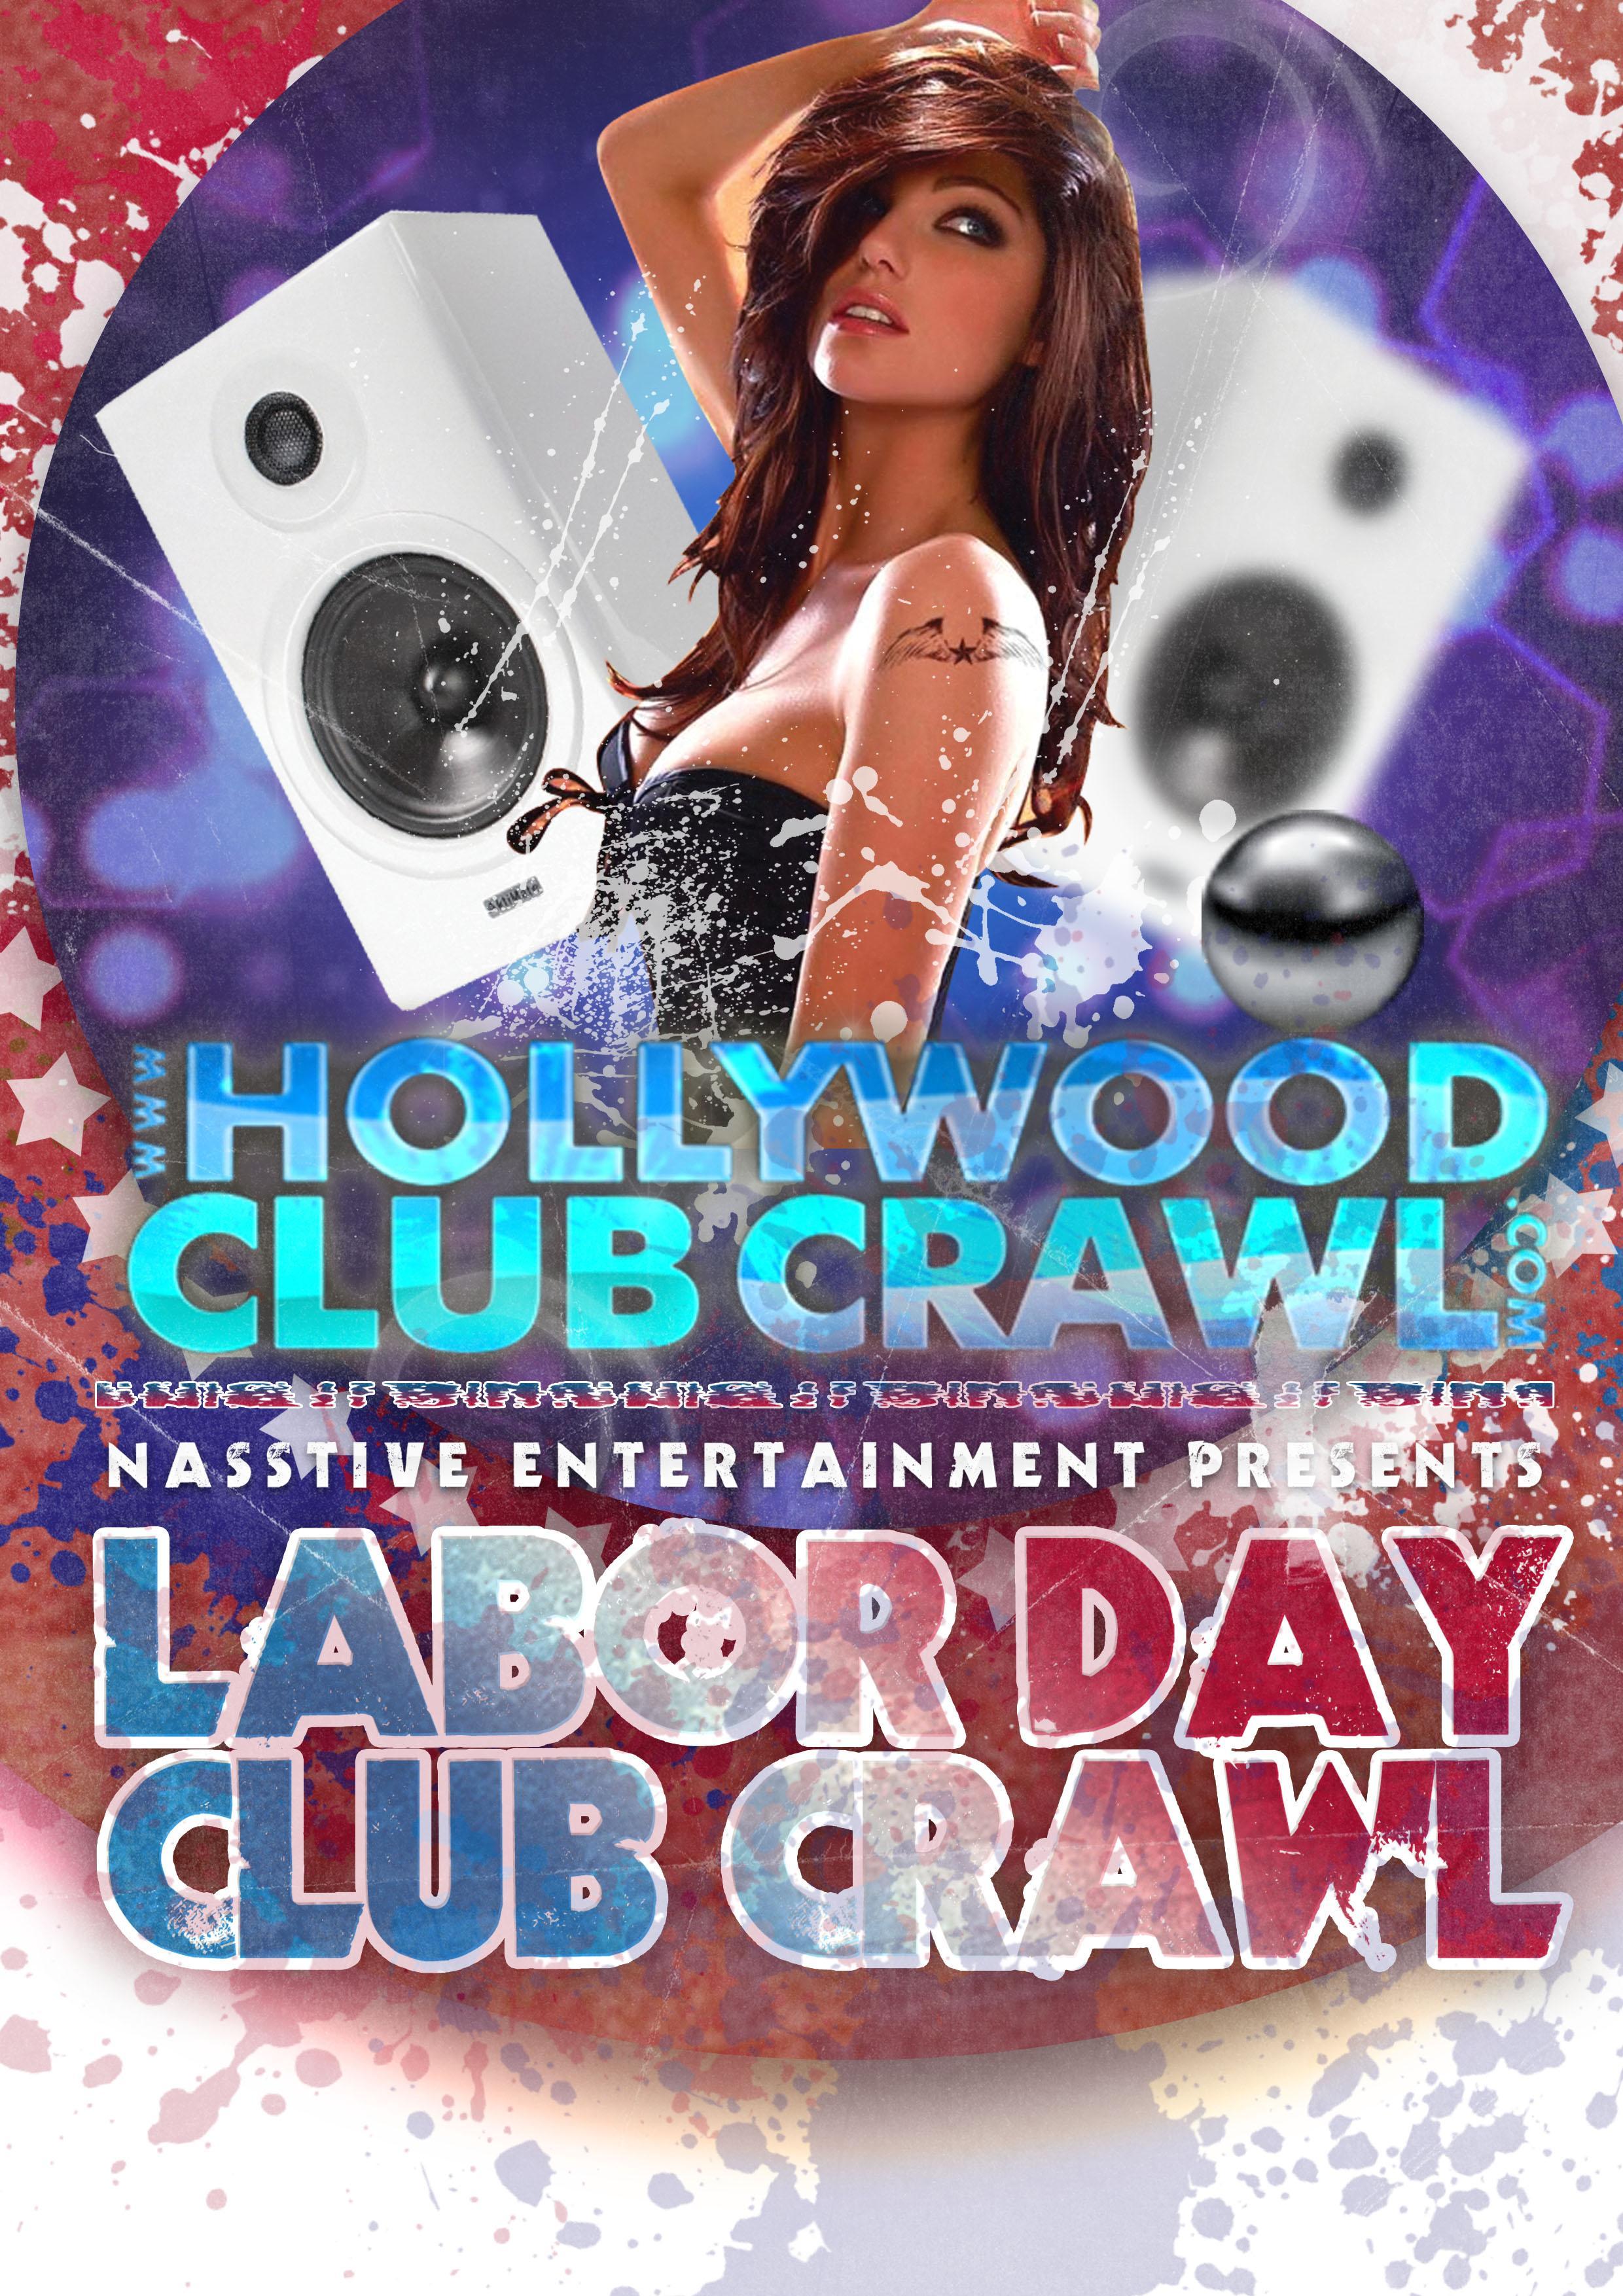 Hollywood Labor Day Club Crawl - Sunday, September 1st